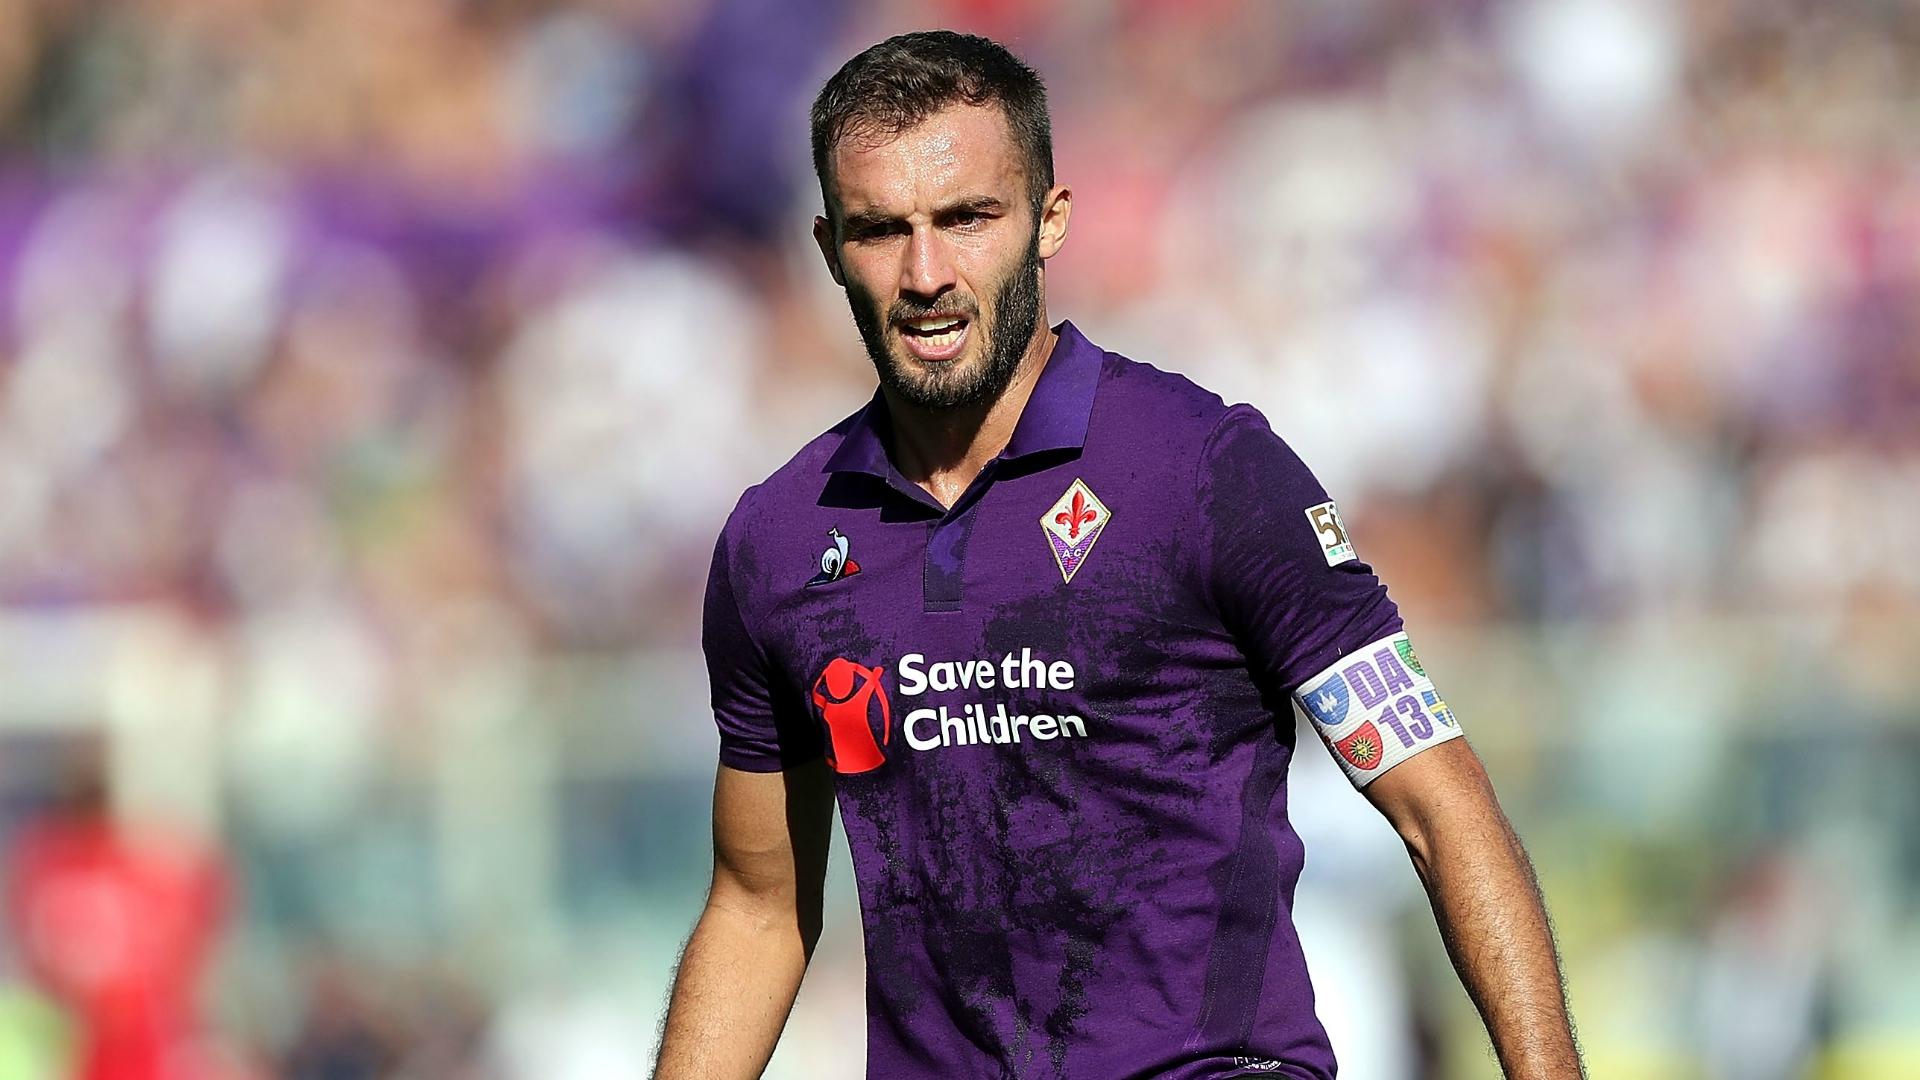 German Pezzella Fiorentina Atalanta Serie A 09302018